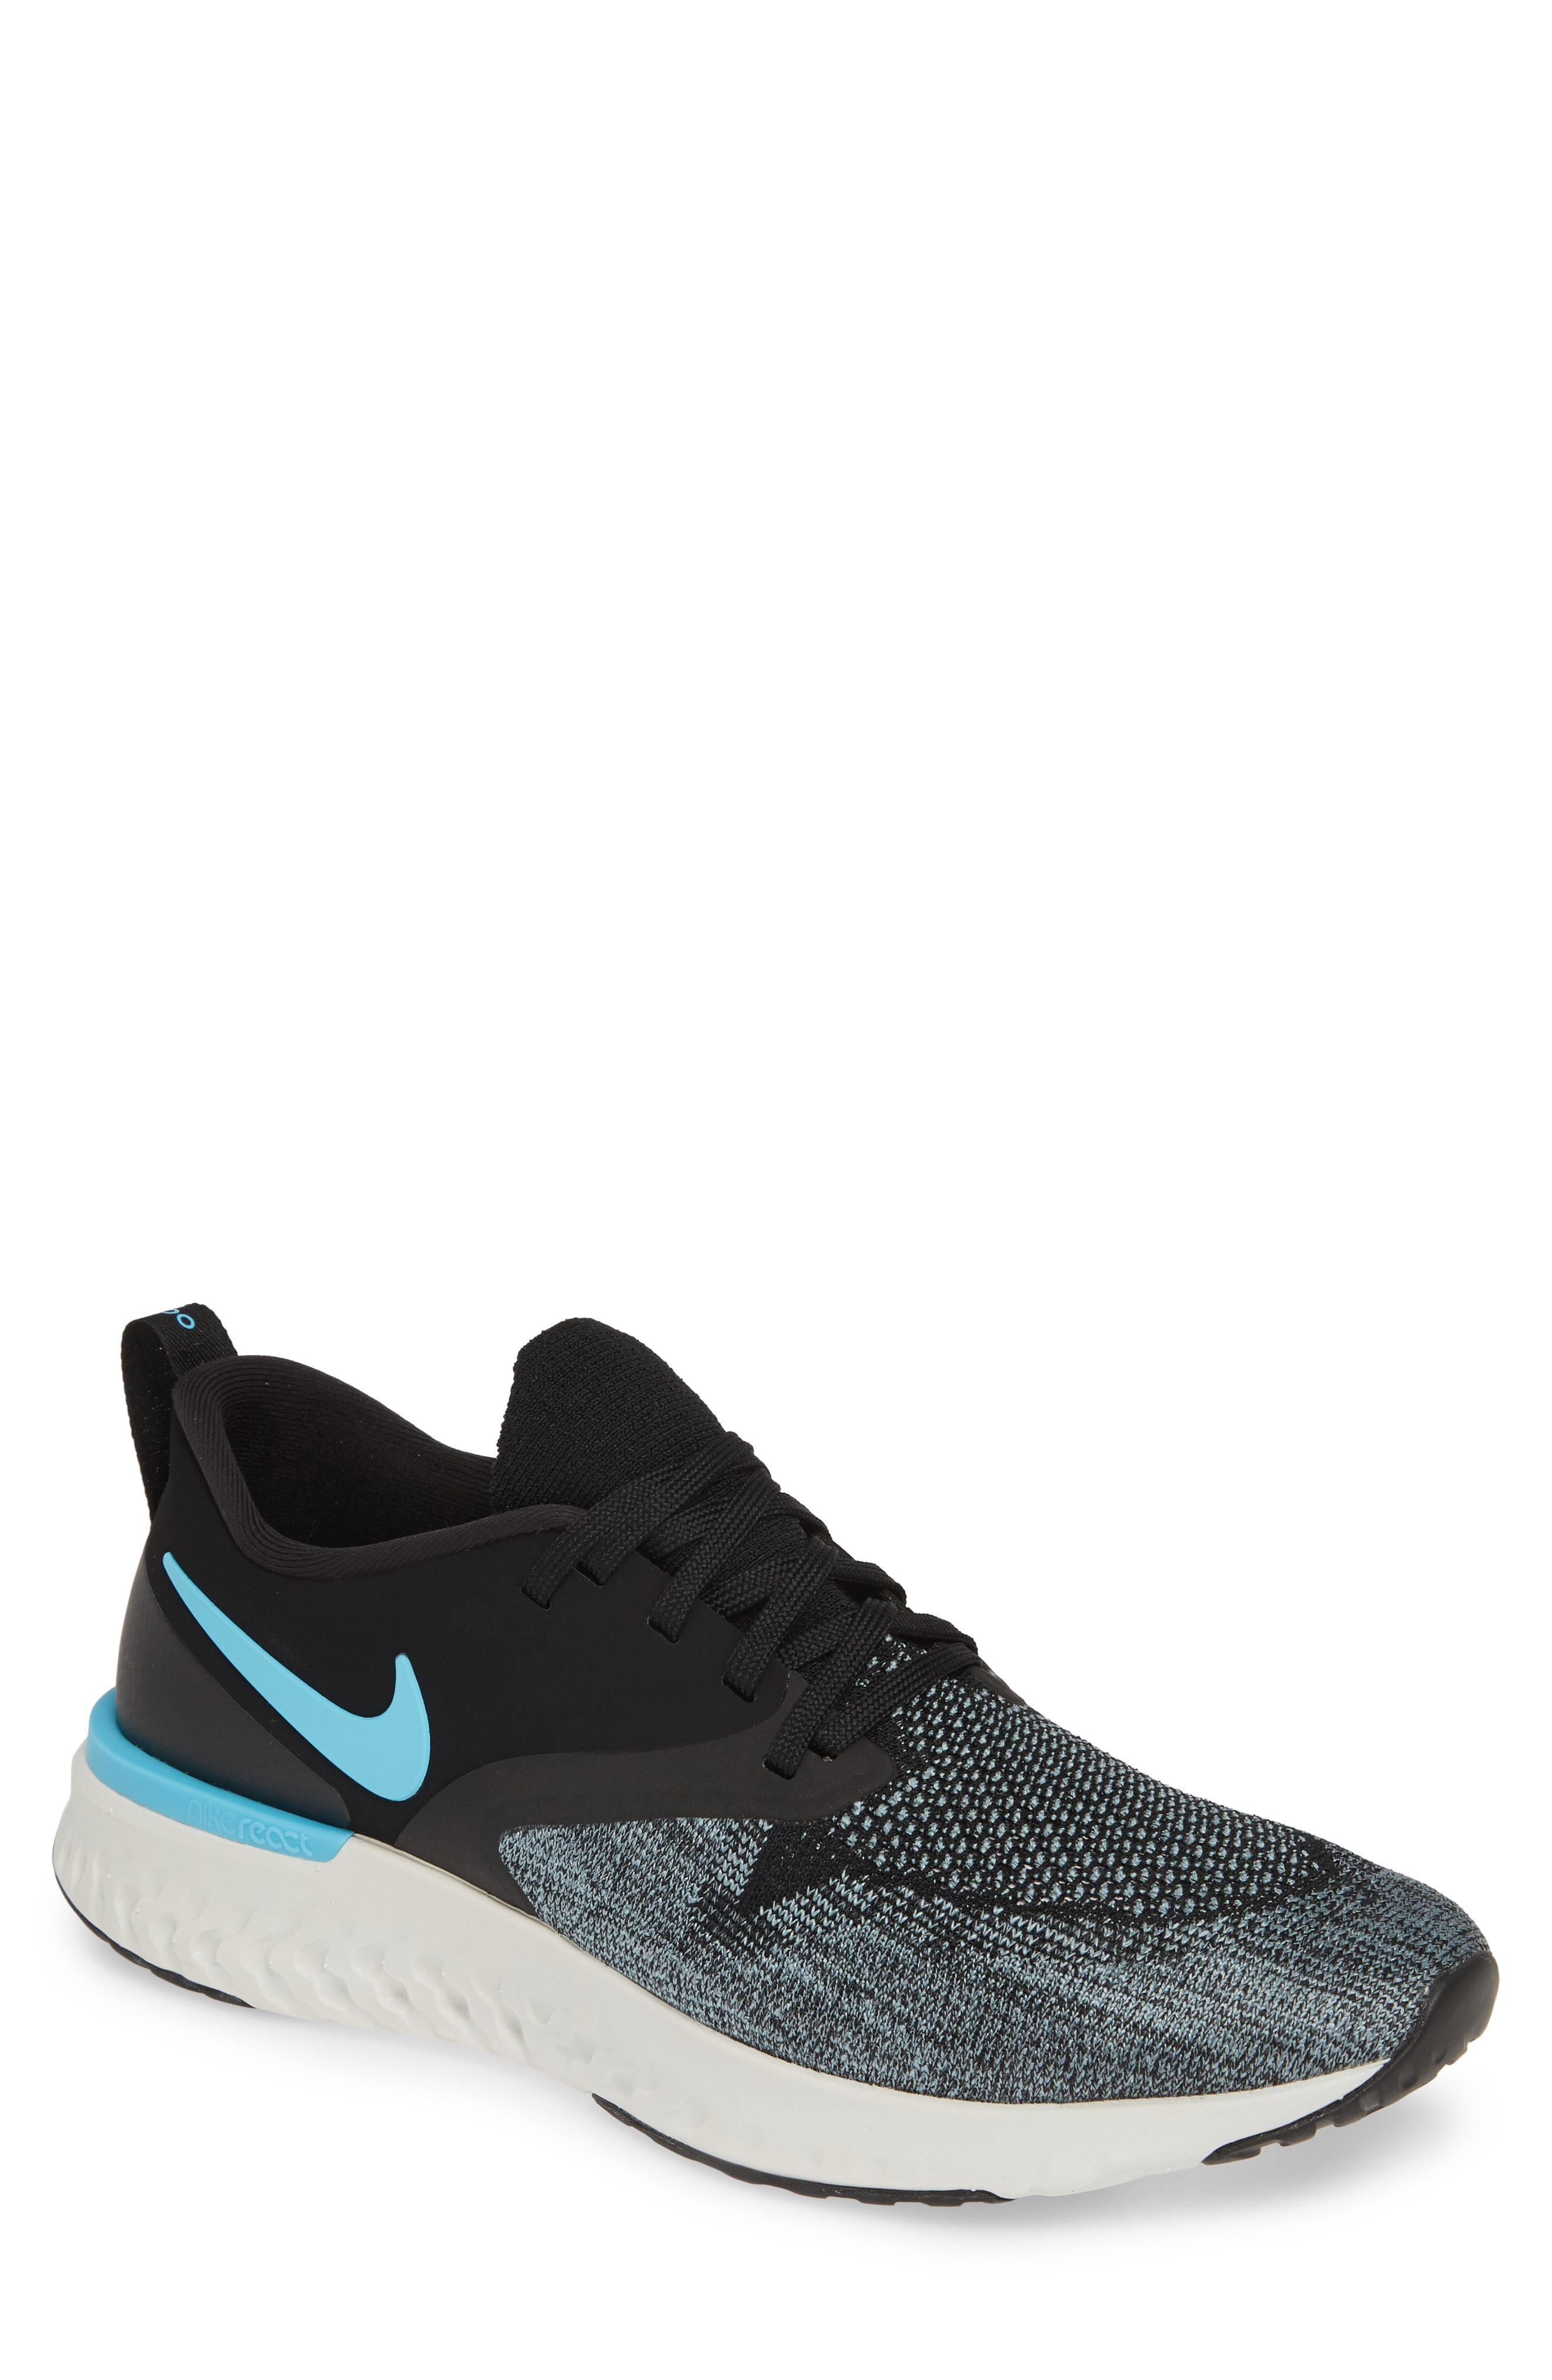 e33307d7b2fa77 Nike. Men s Black Odyssey React 2 Flyknit Running Shoe